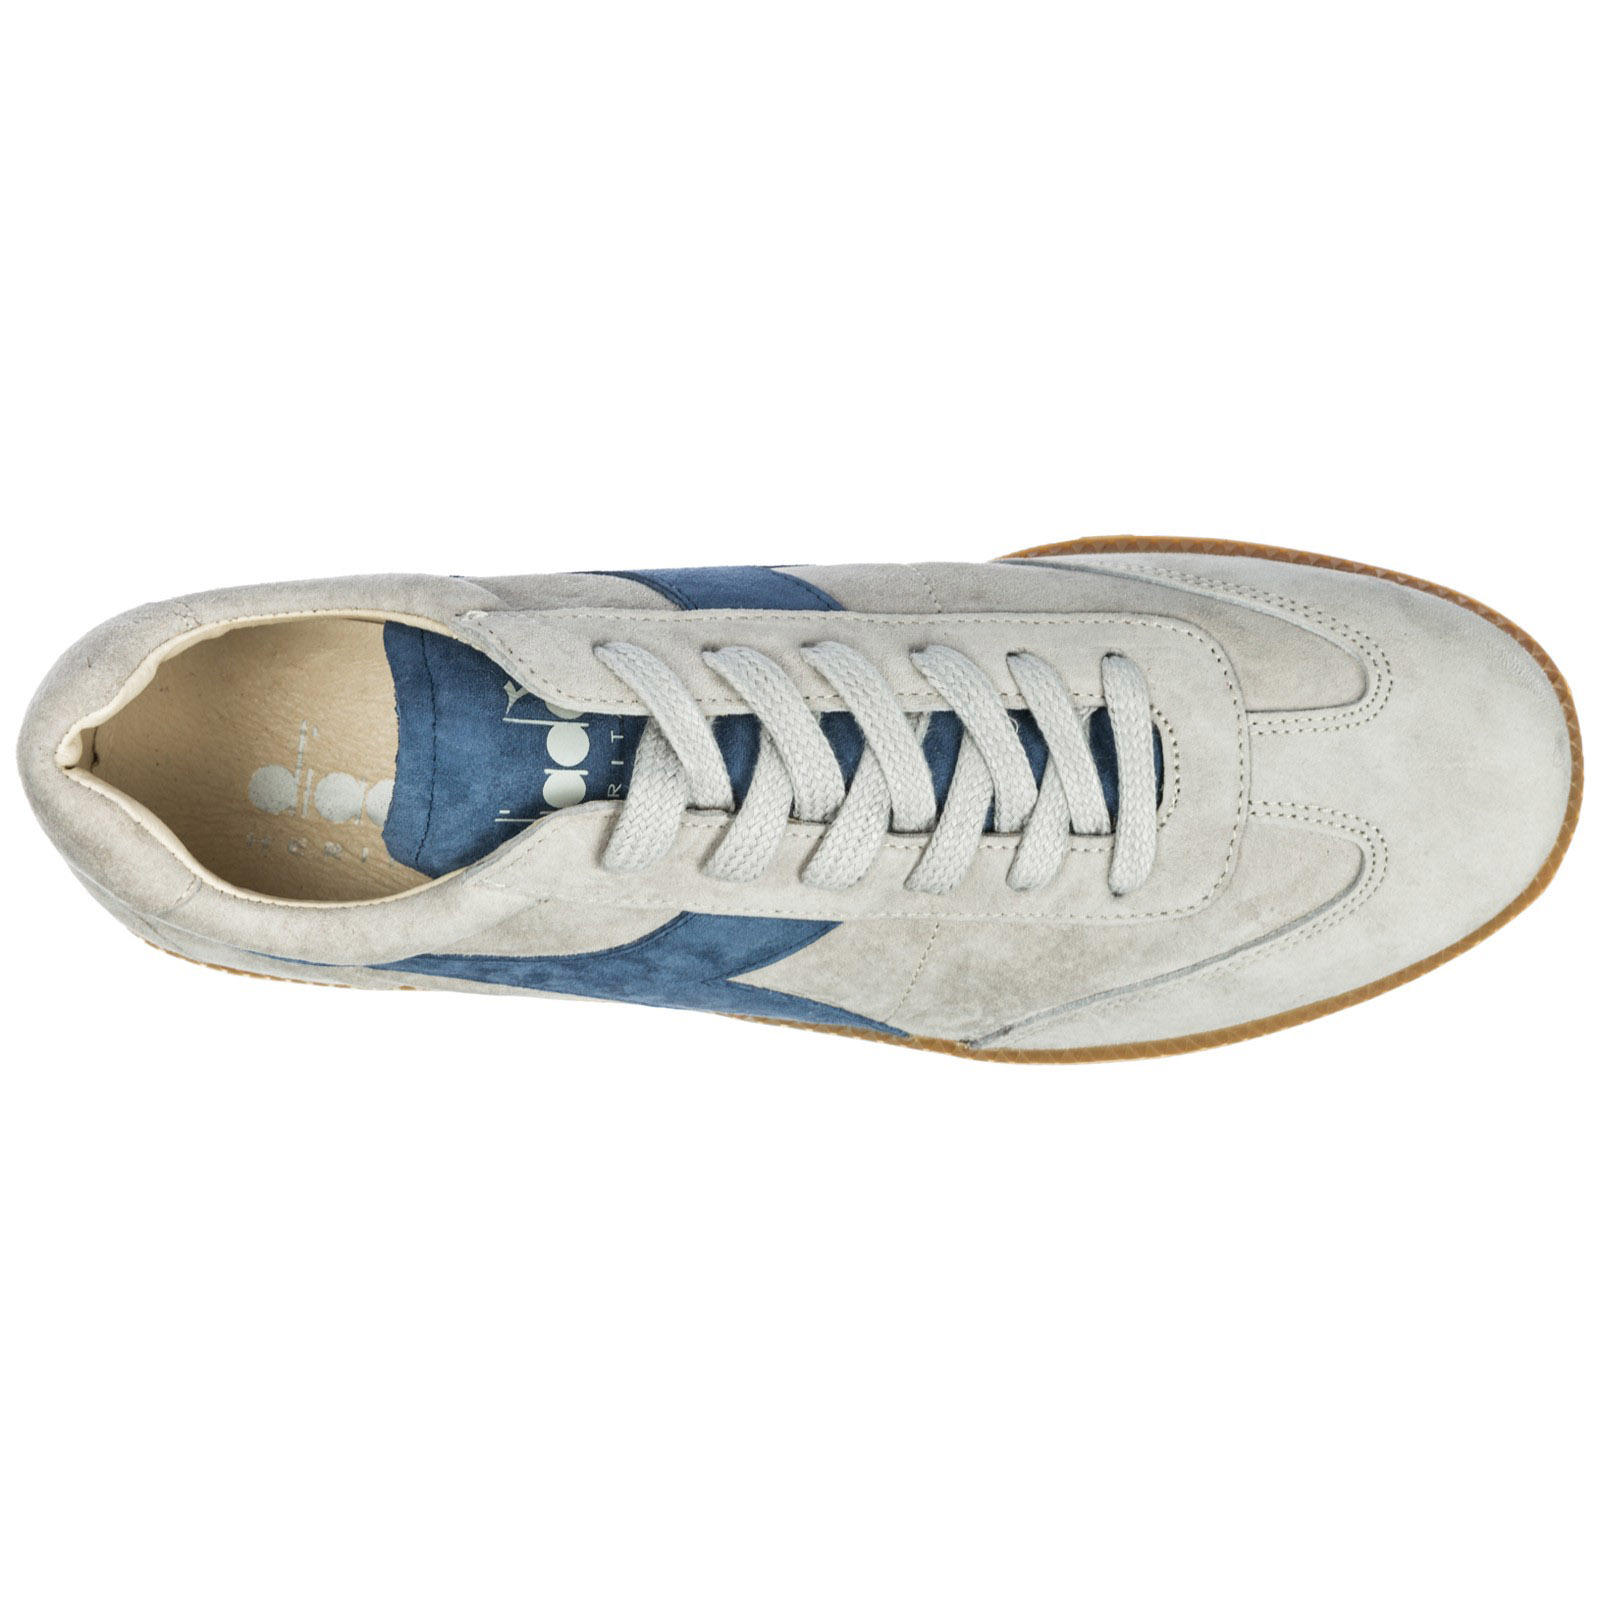 ... Zapatos zapatillas de deporte hombres en ante football 80 s core 3 evo  ... fed0bfbc80017